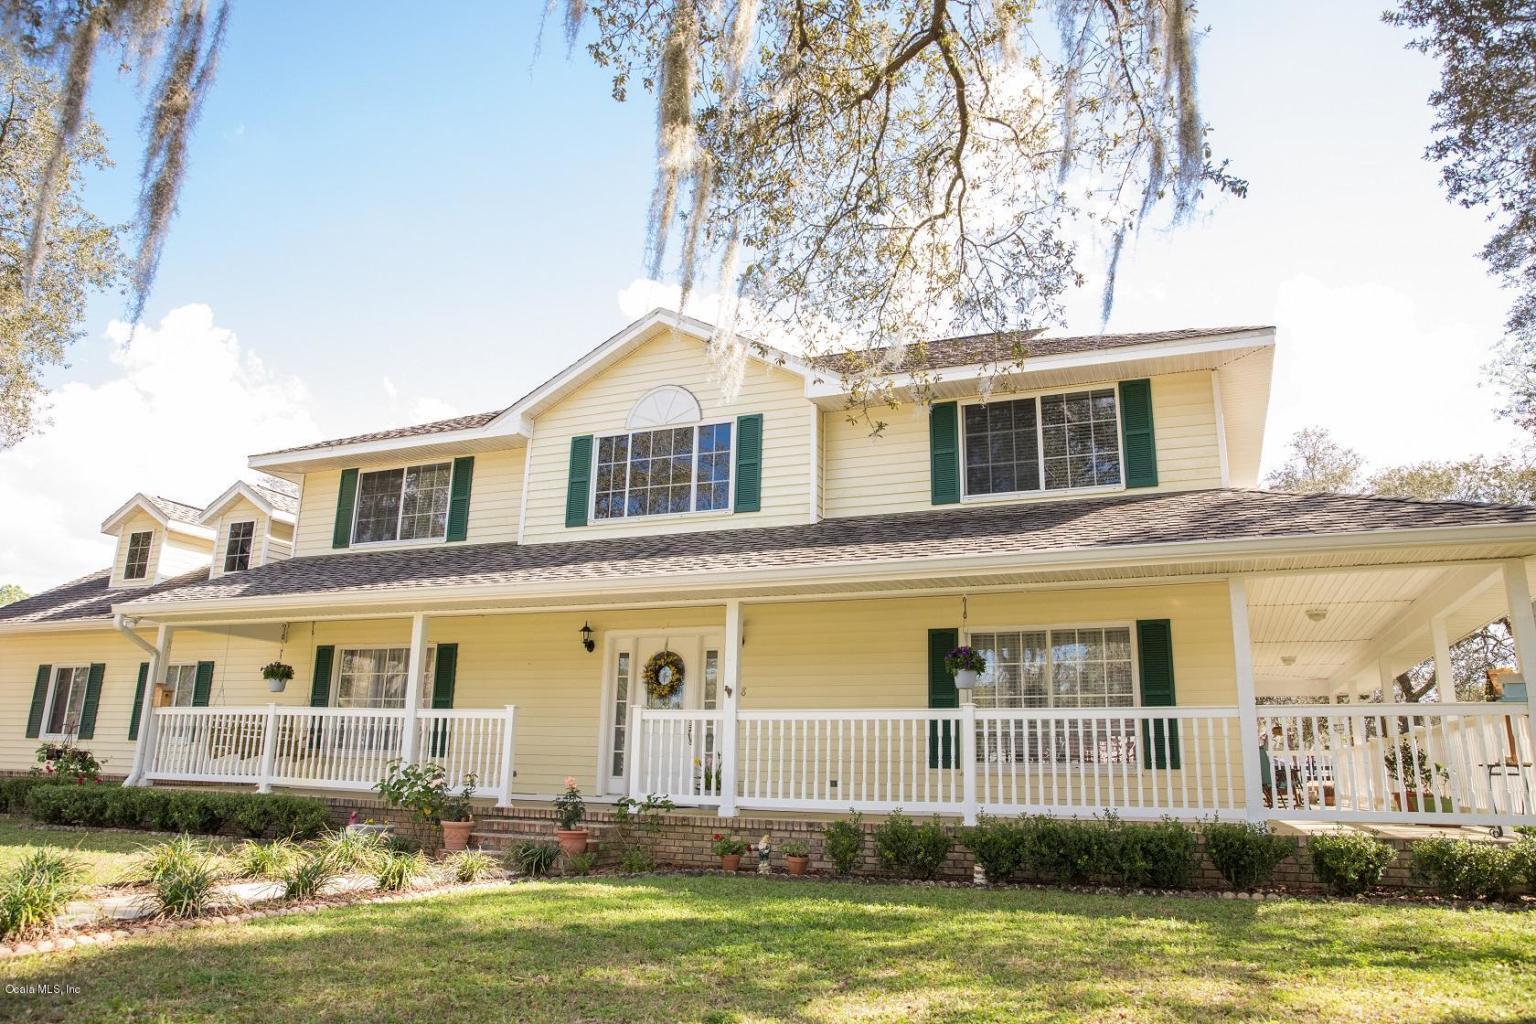 two story farmhouse with wrap around porch